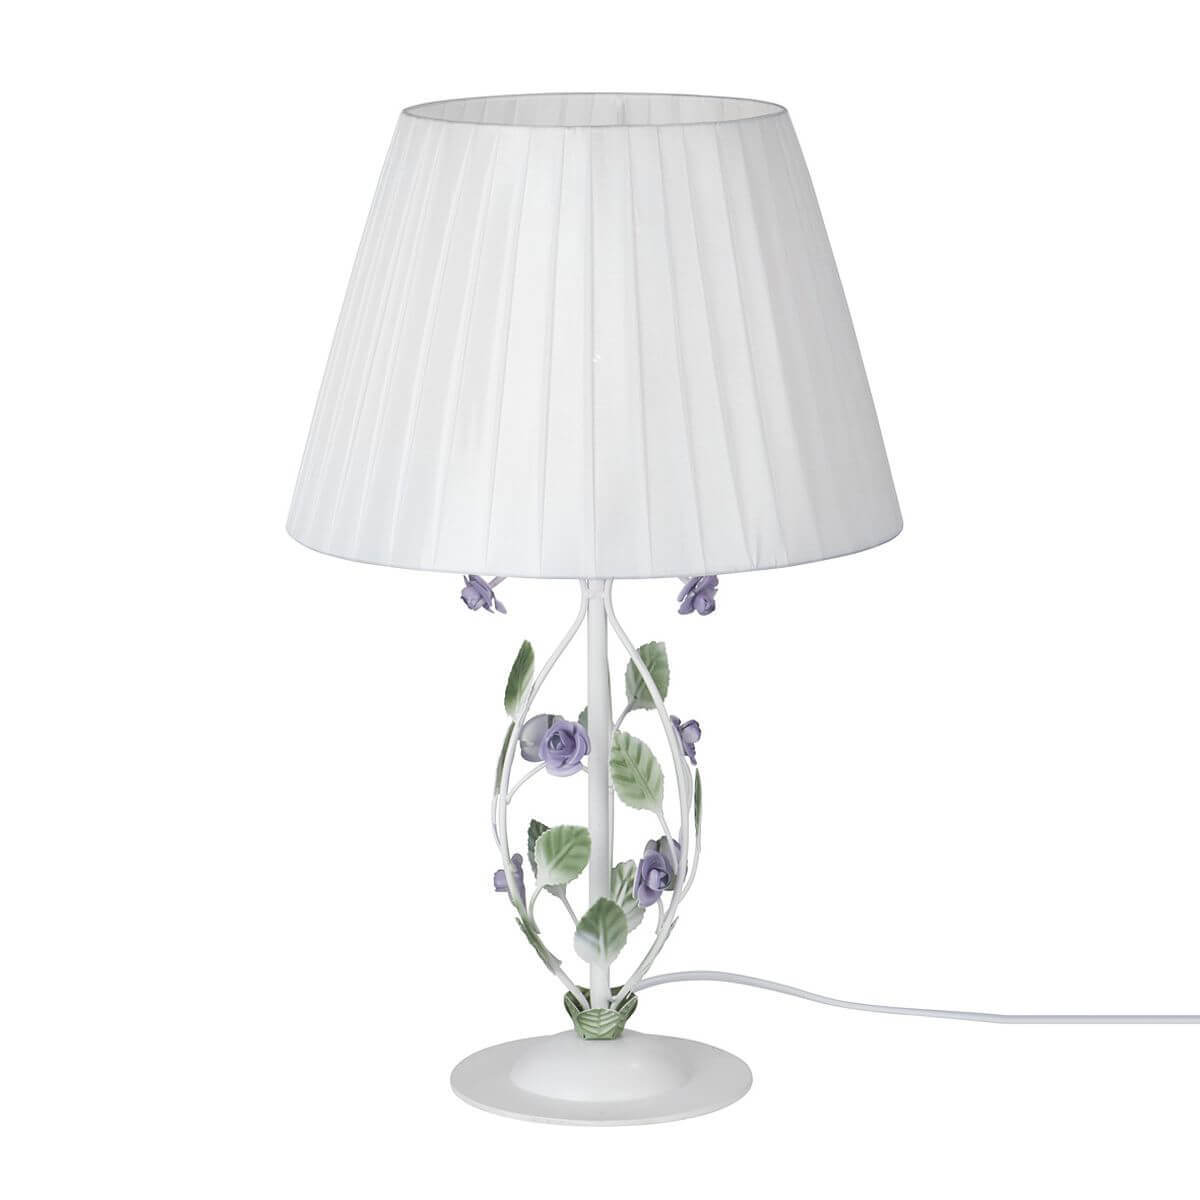 Настольная лампа Vitaluce V1794-0/1L люстра vitaluce v1794 0 8